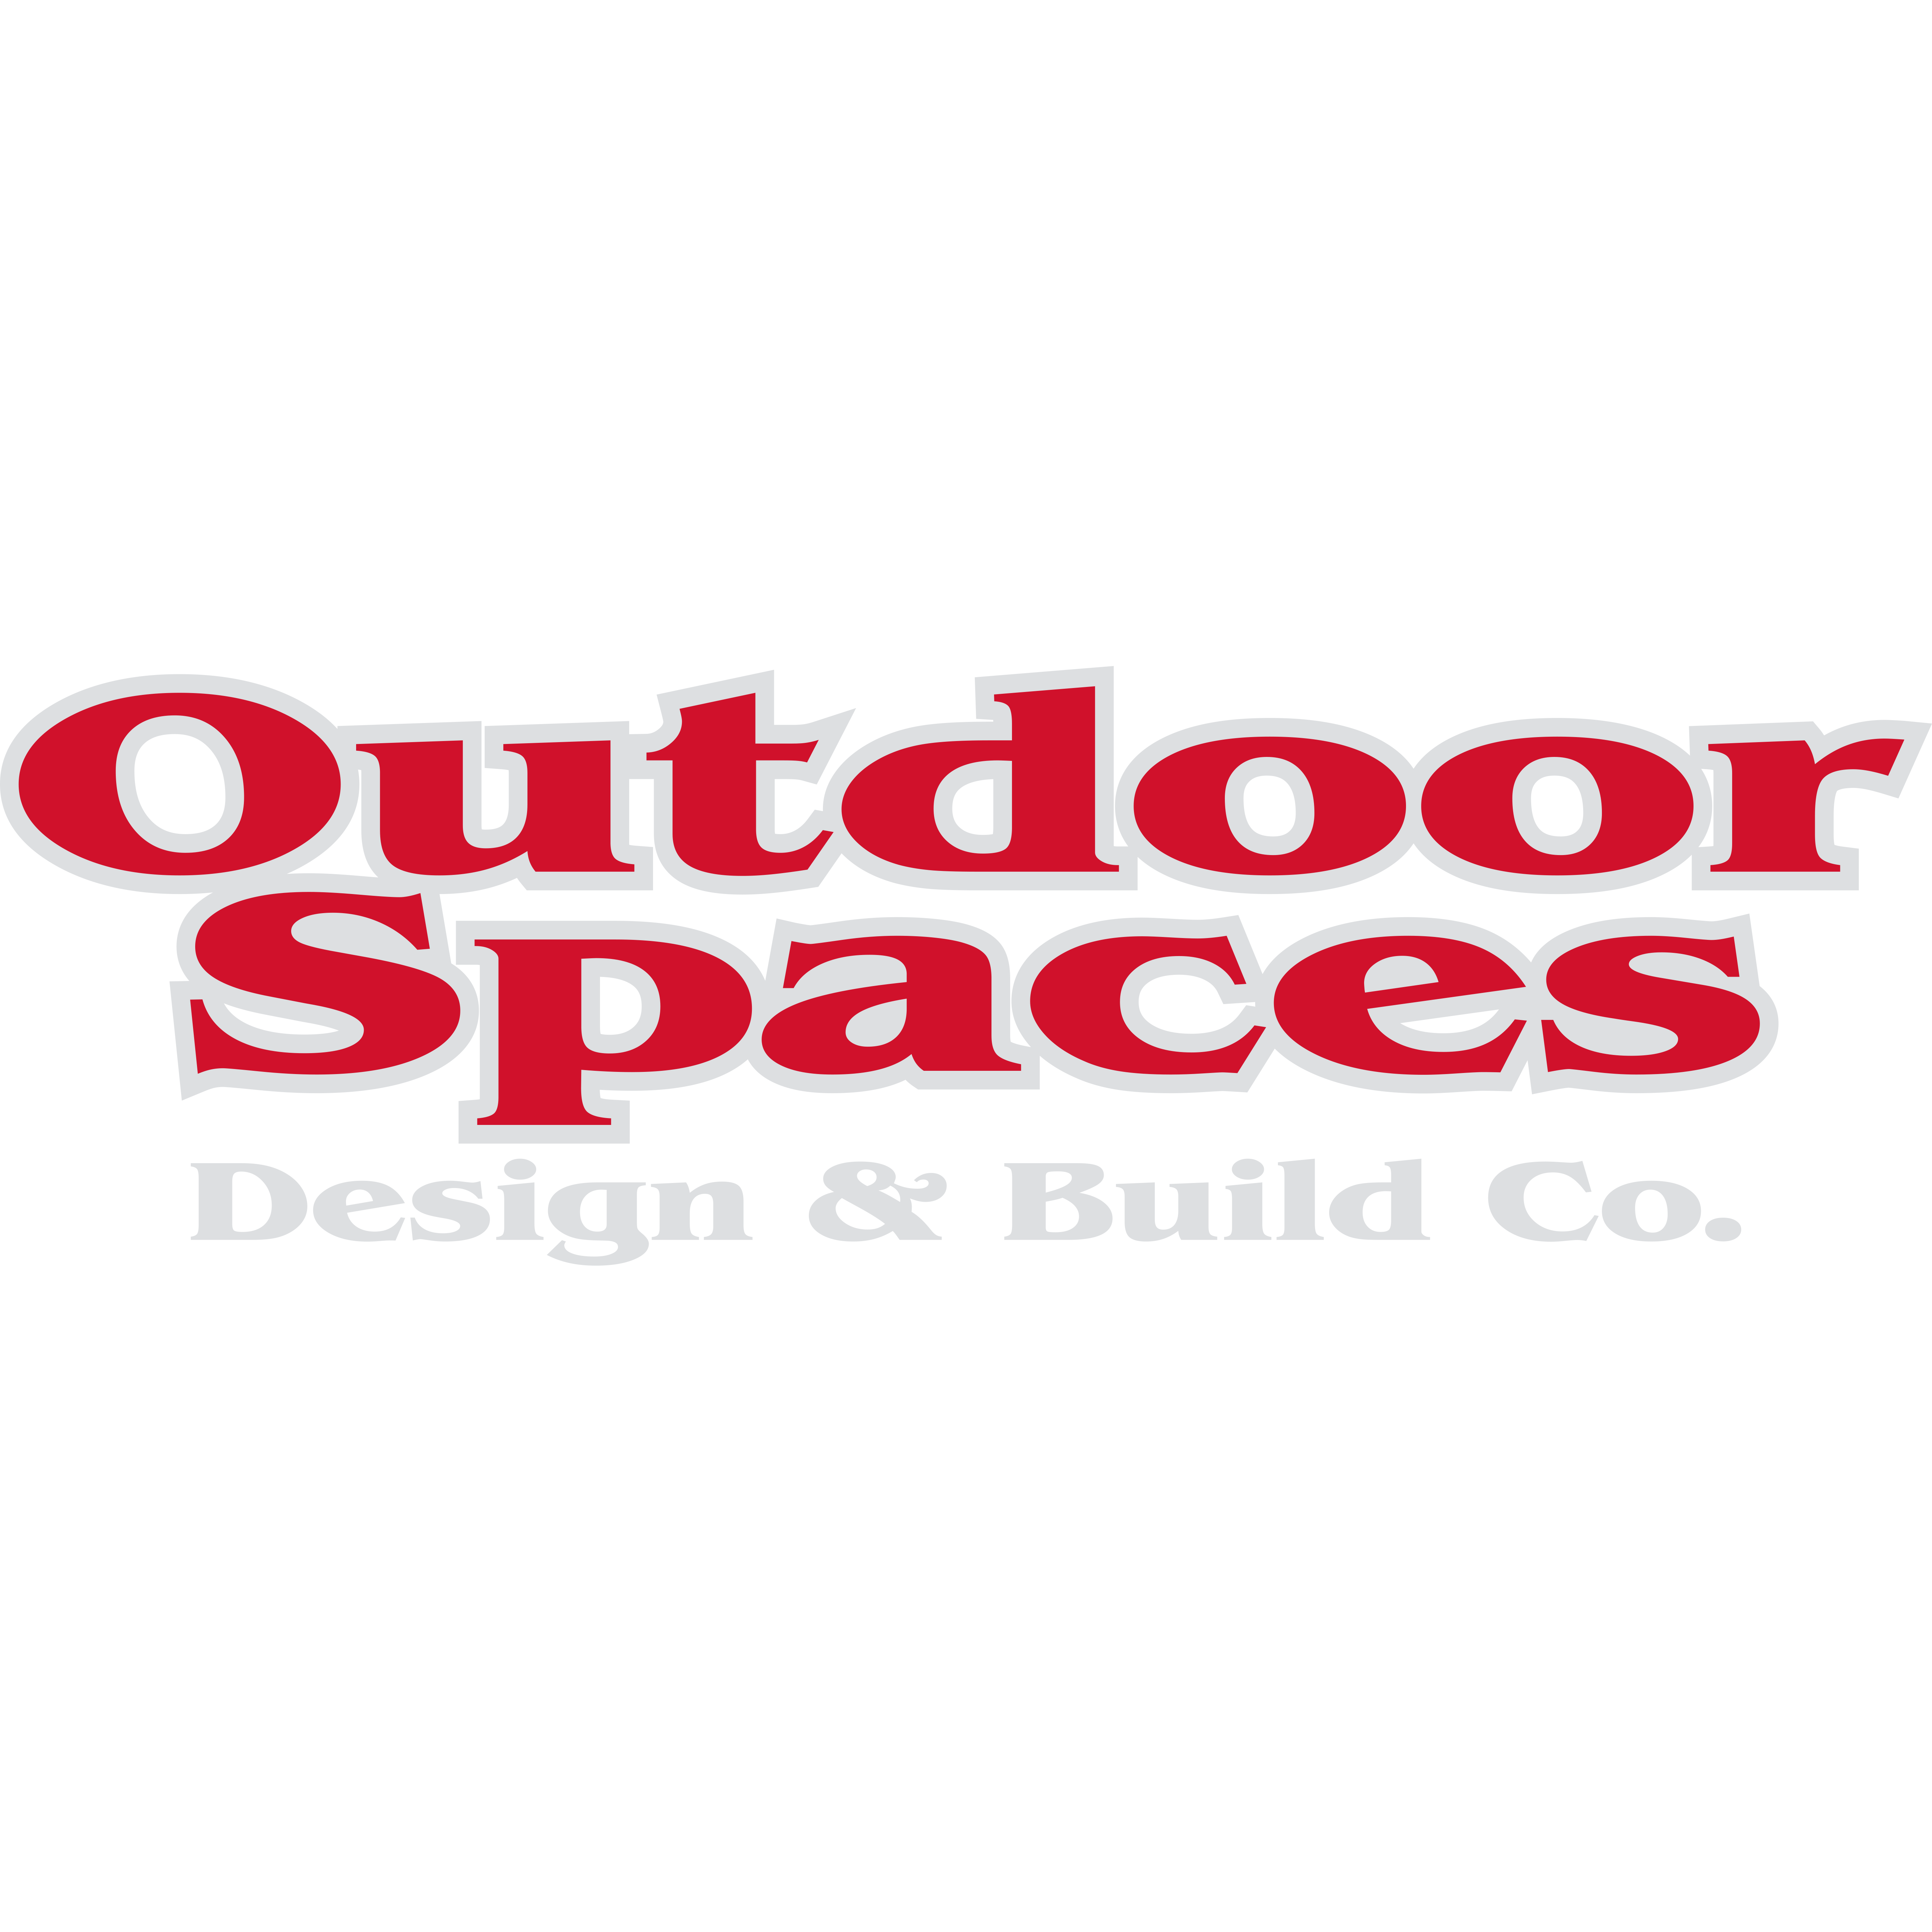 Outdoor Spaces Design & Build Co.